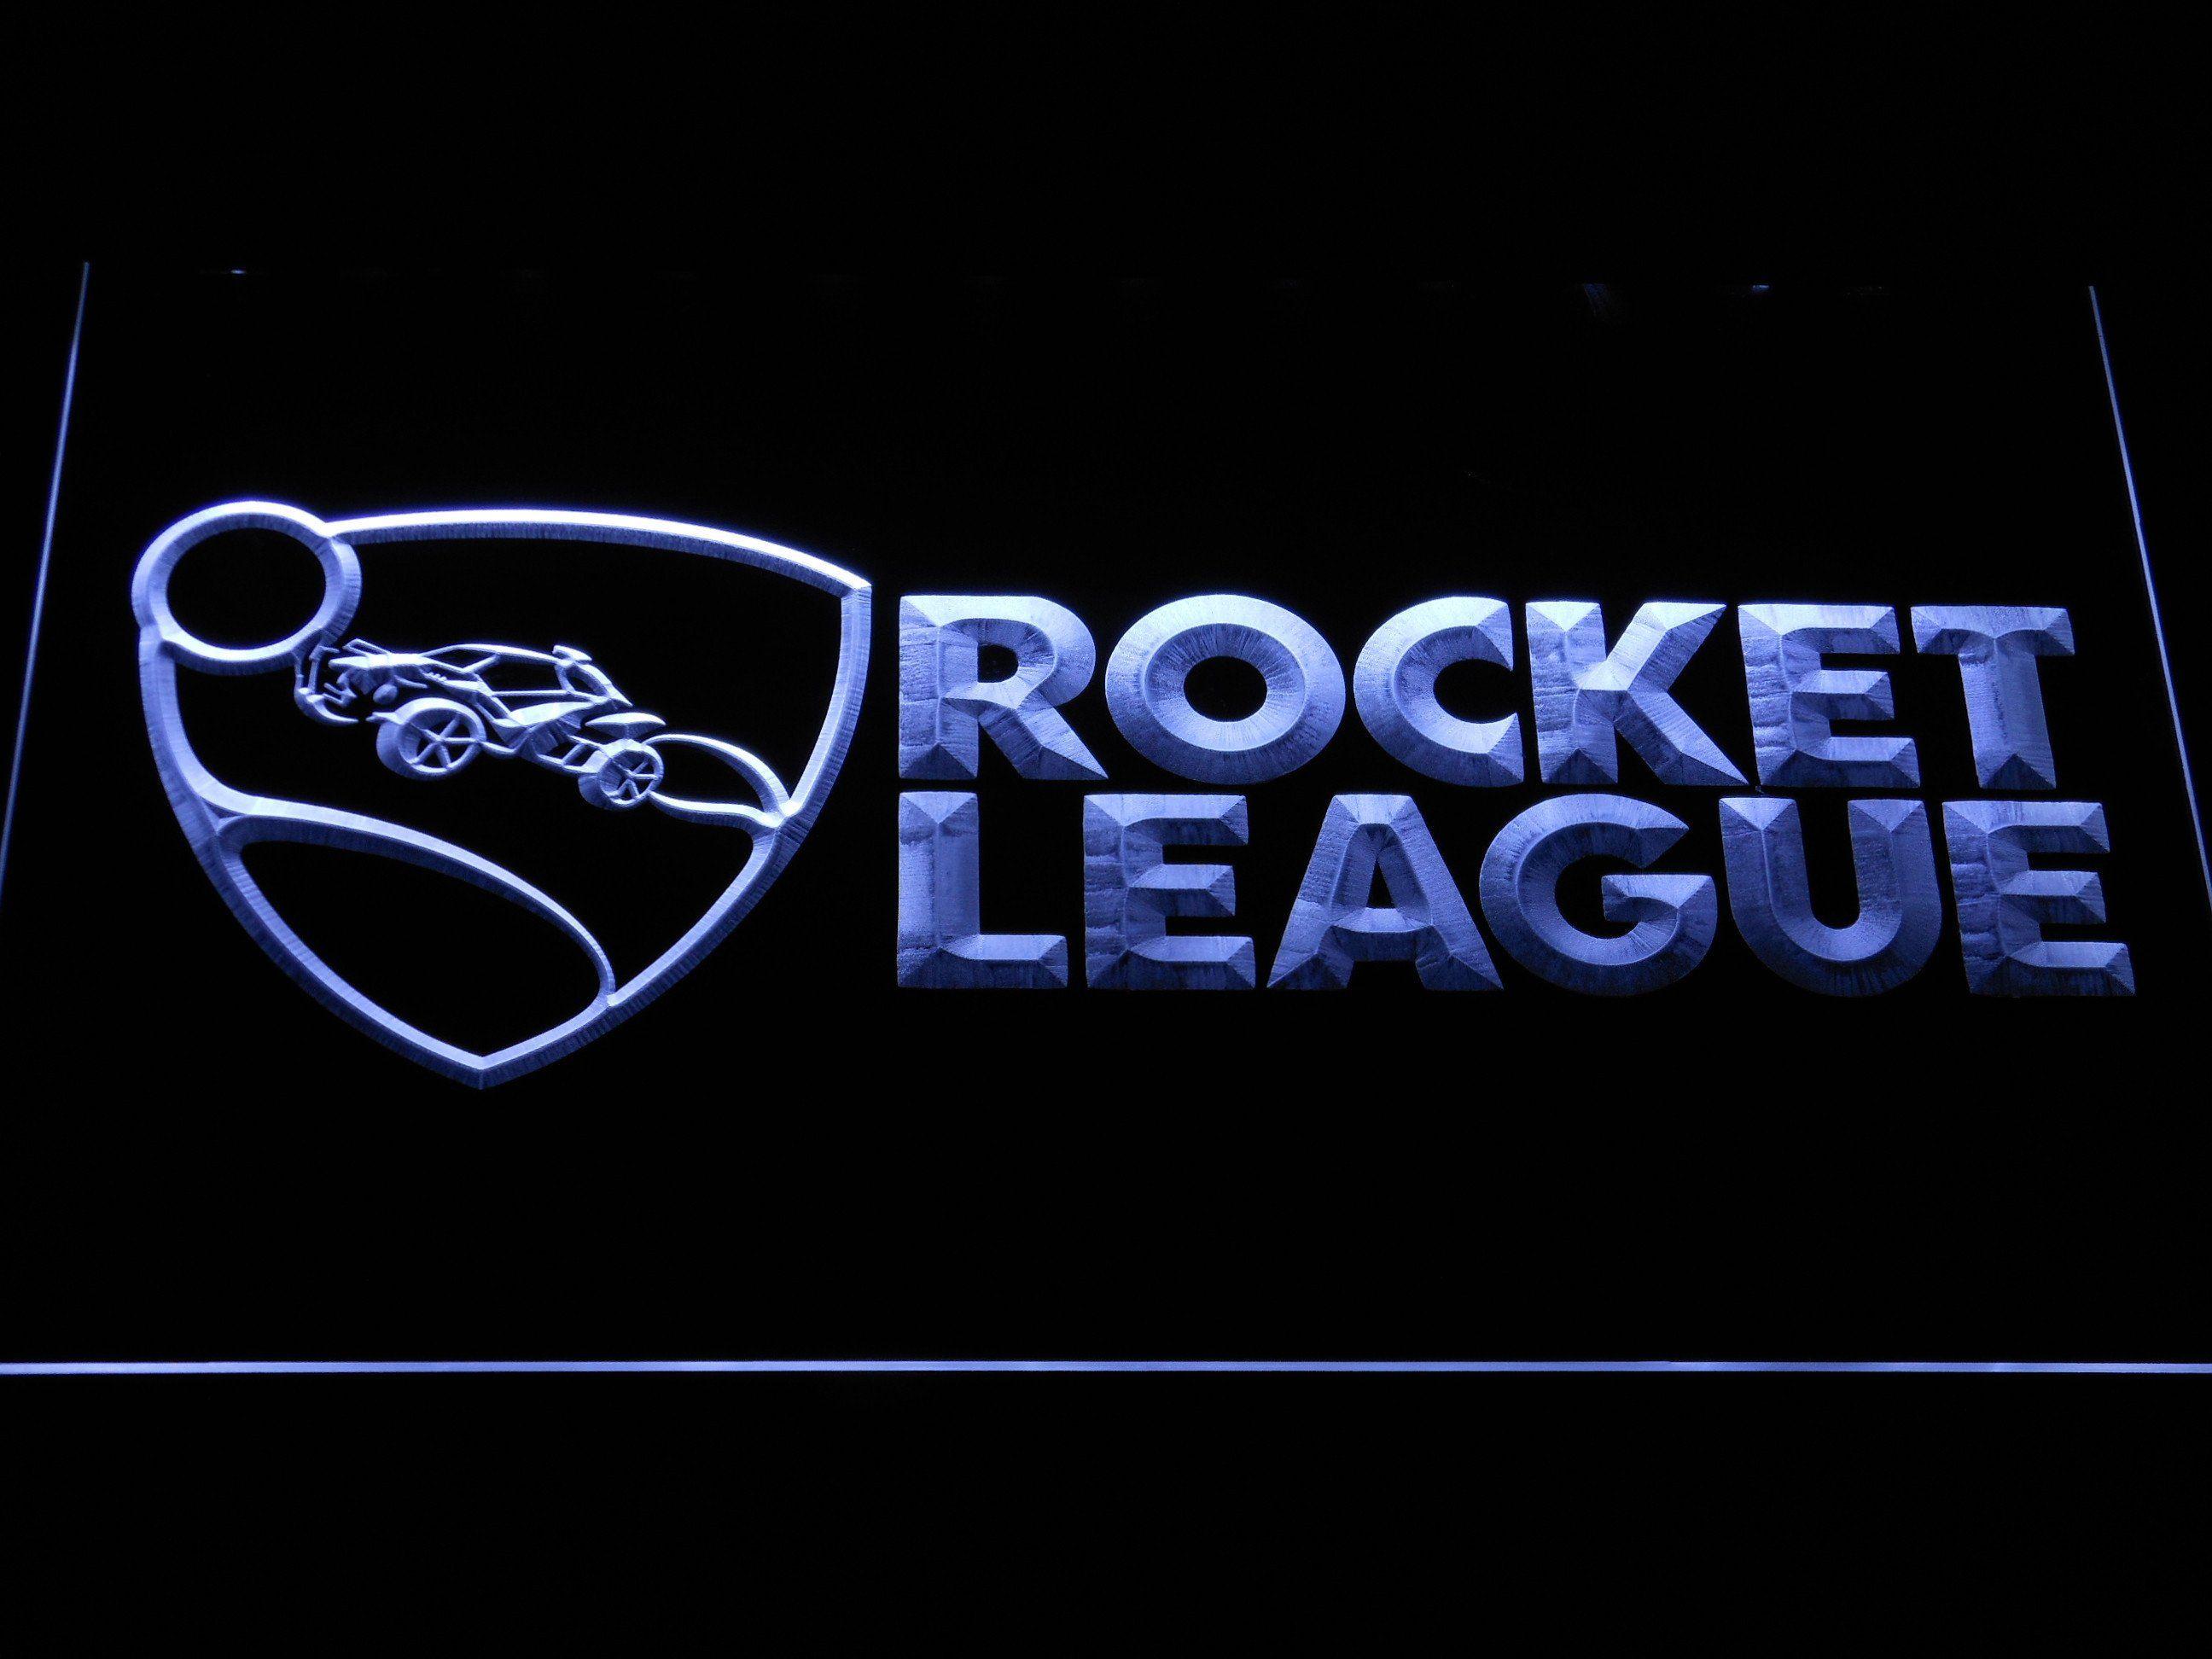 Rocket League Logo Vinyl Decal Rocket League Rocket League Logo Rocket